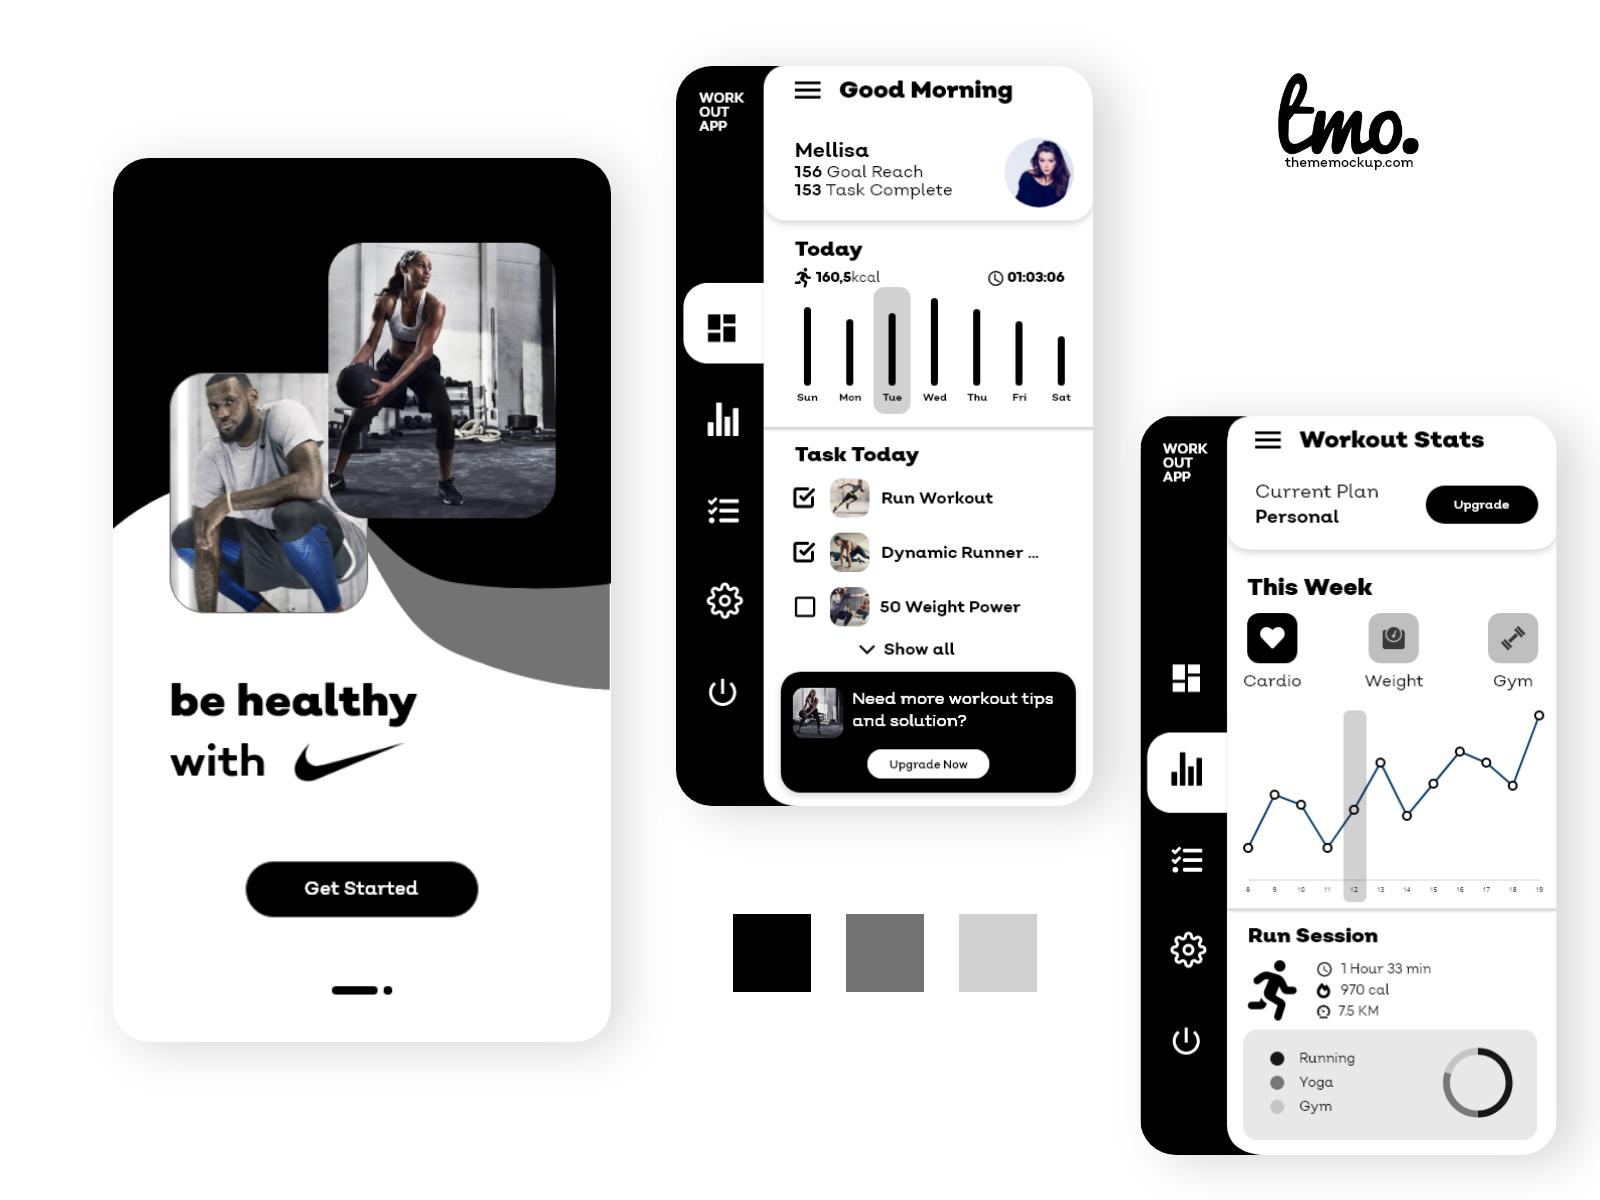 Nike Workout Redesign App Concept presentation image